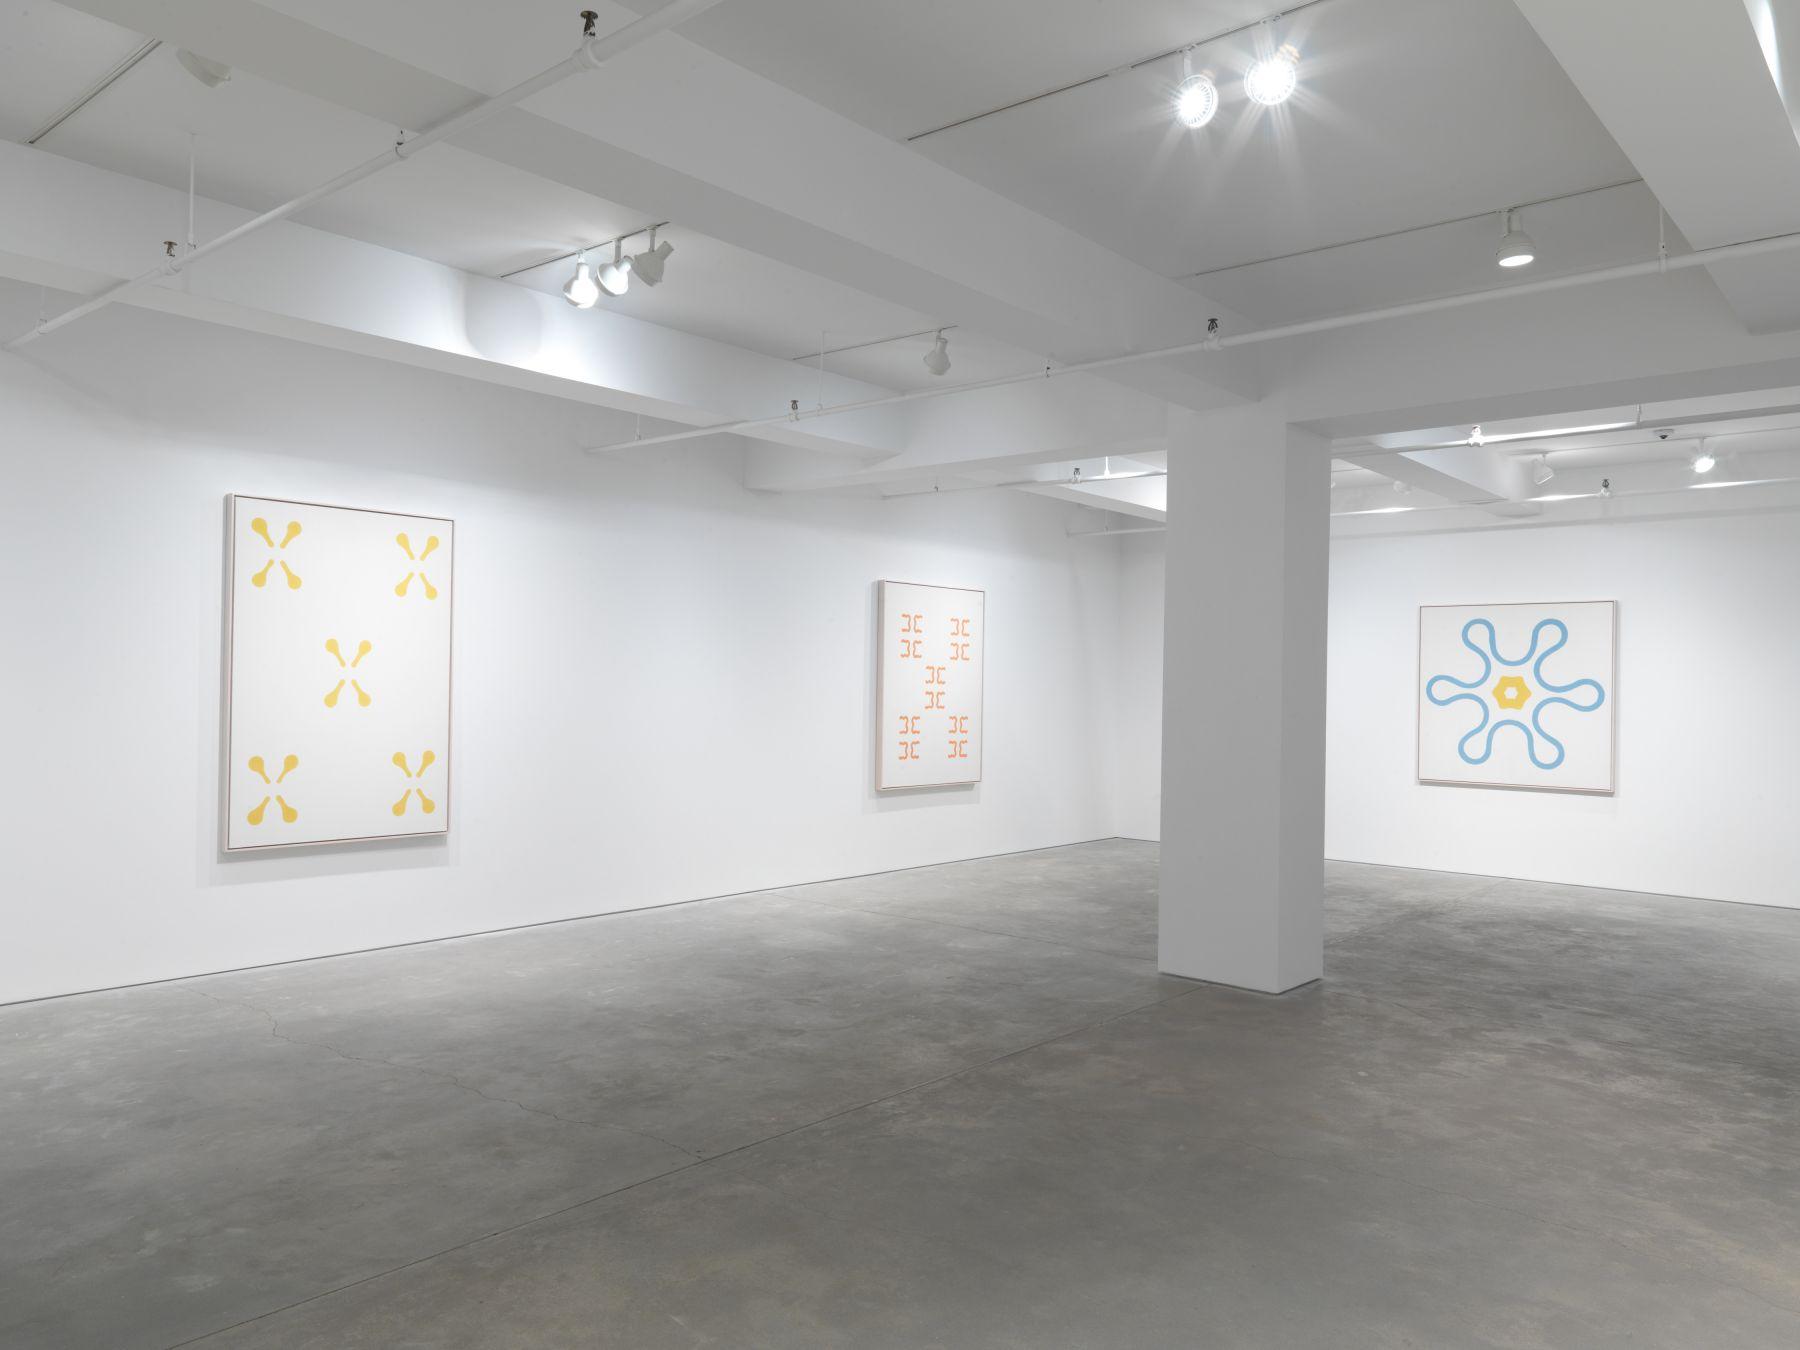 Paul Feeley: An Artist's Game with Jacks